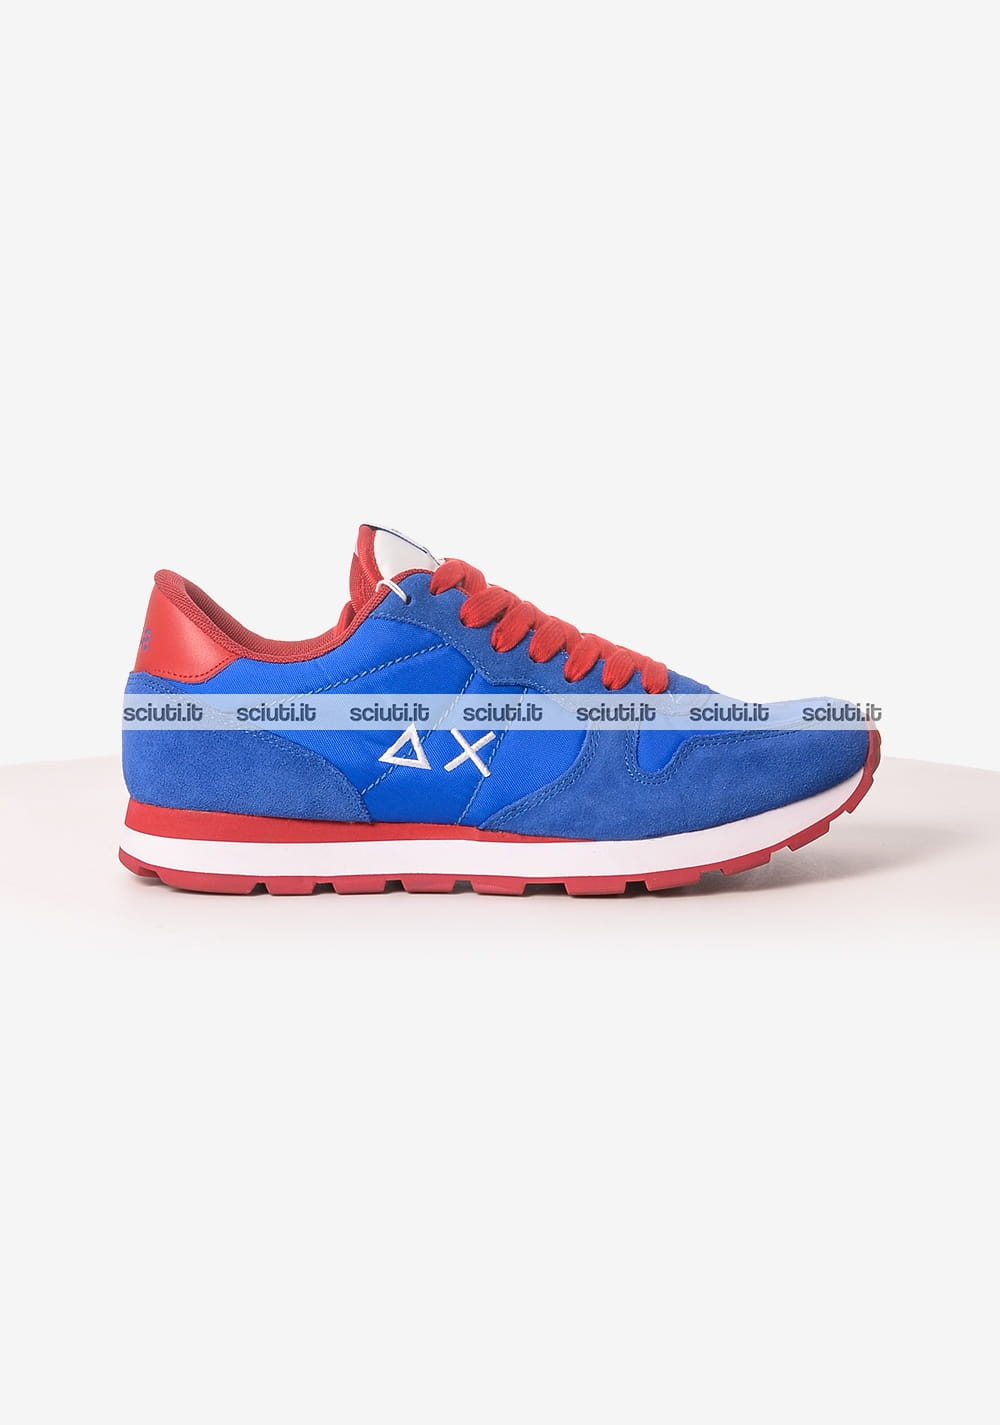 Scarpe Sun68 uomo running bicolor nylon blu royal | Sciuti.it